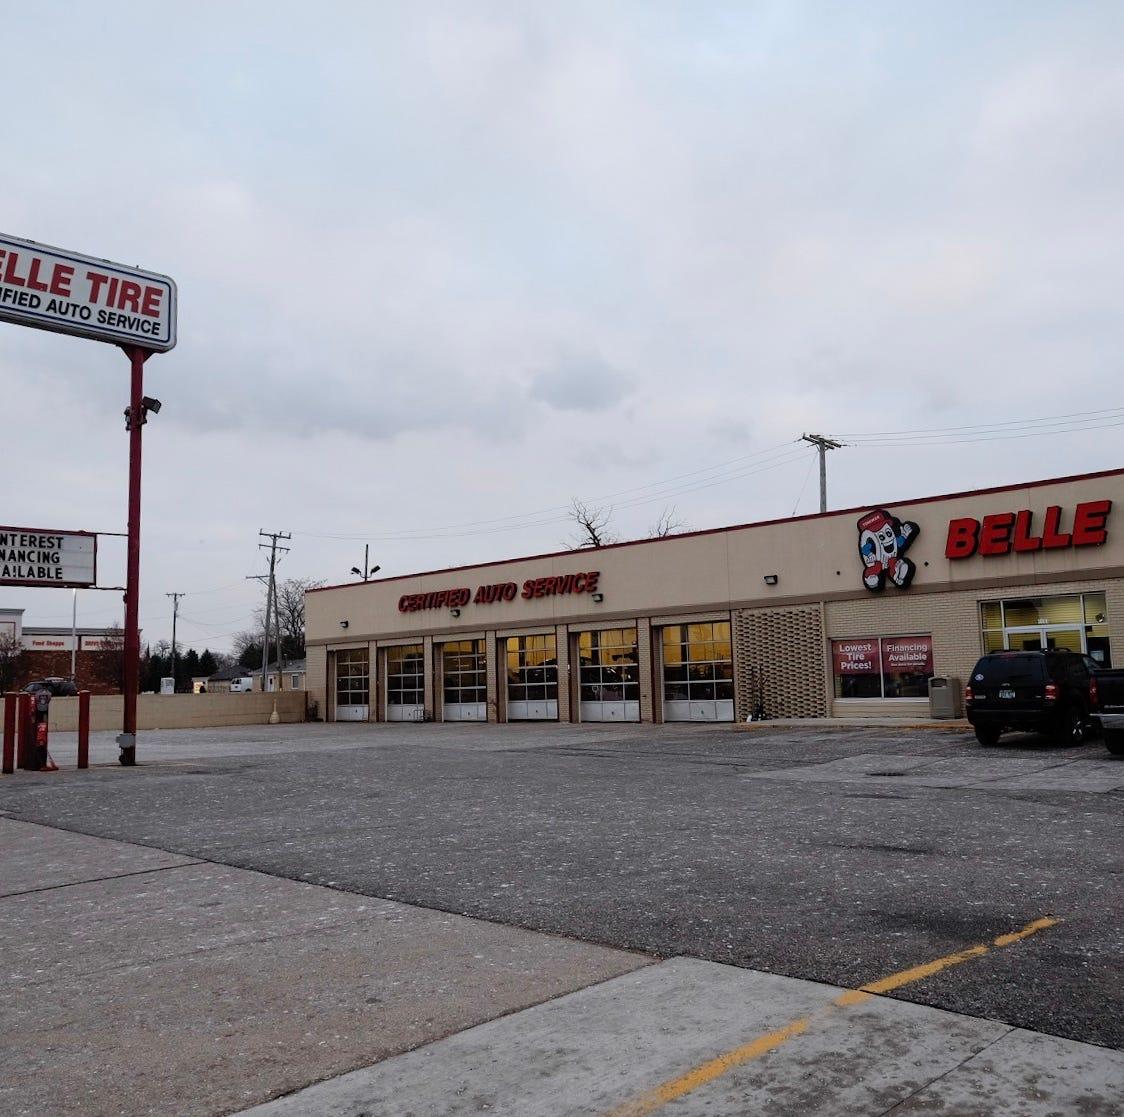 Update: Feds sue Port Huron Belle Tire, allege racial harassment